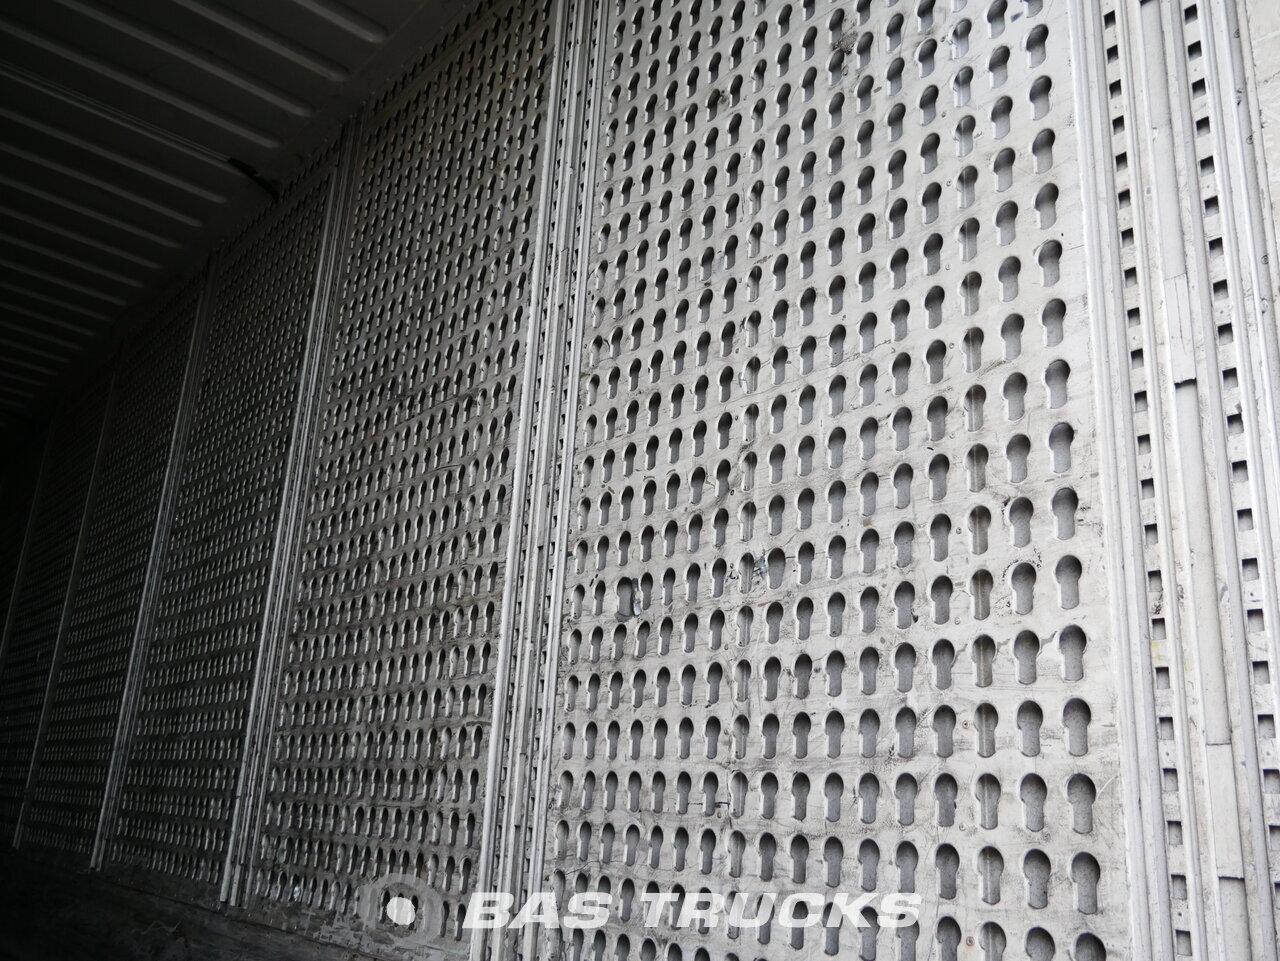 foto de Usado Semirremolque Krone Textil-Confectie-Kleider Palettenkasten SD Ejes 2011